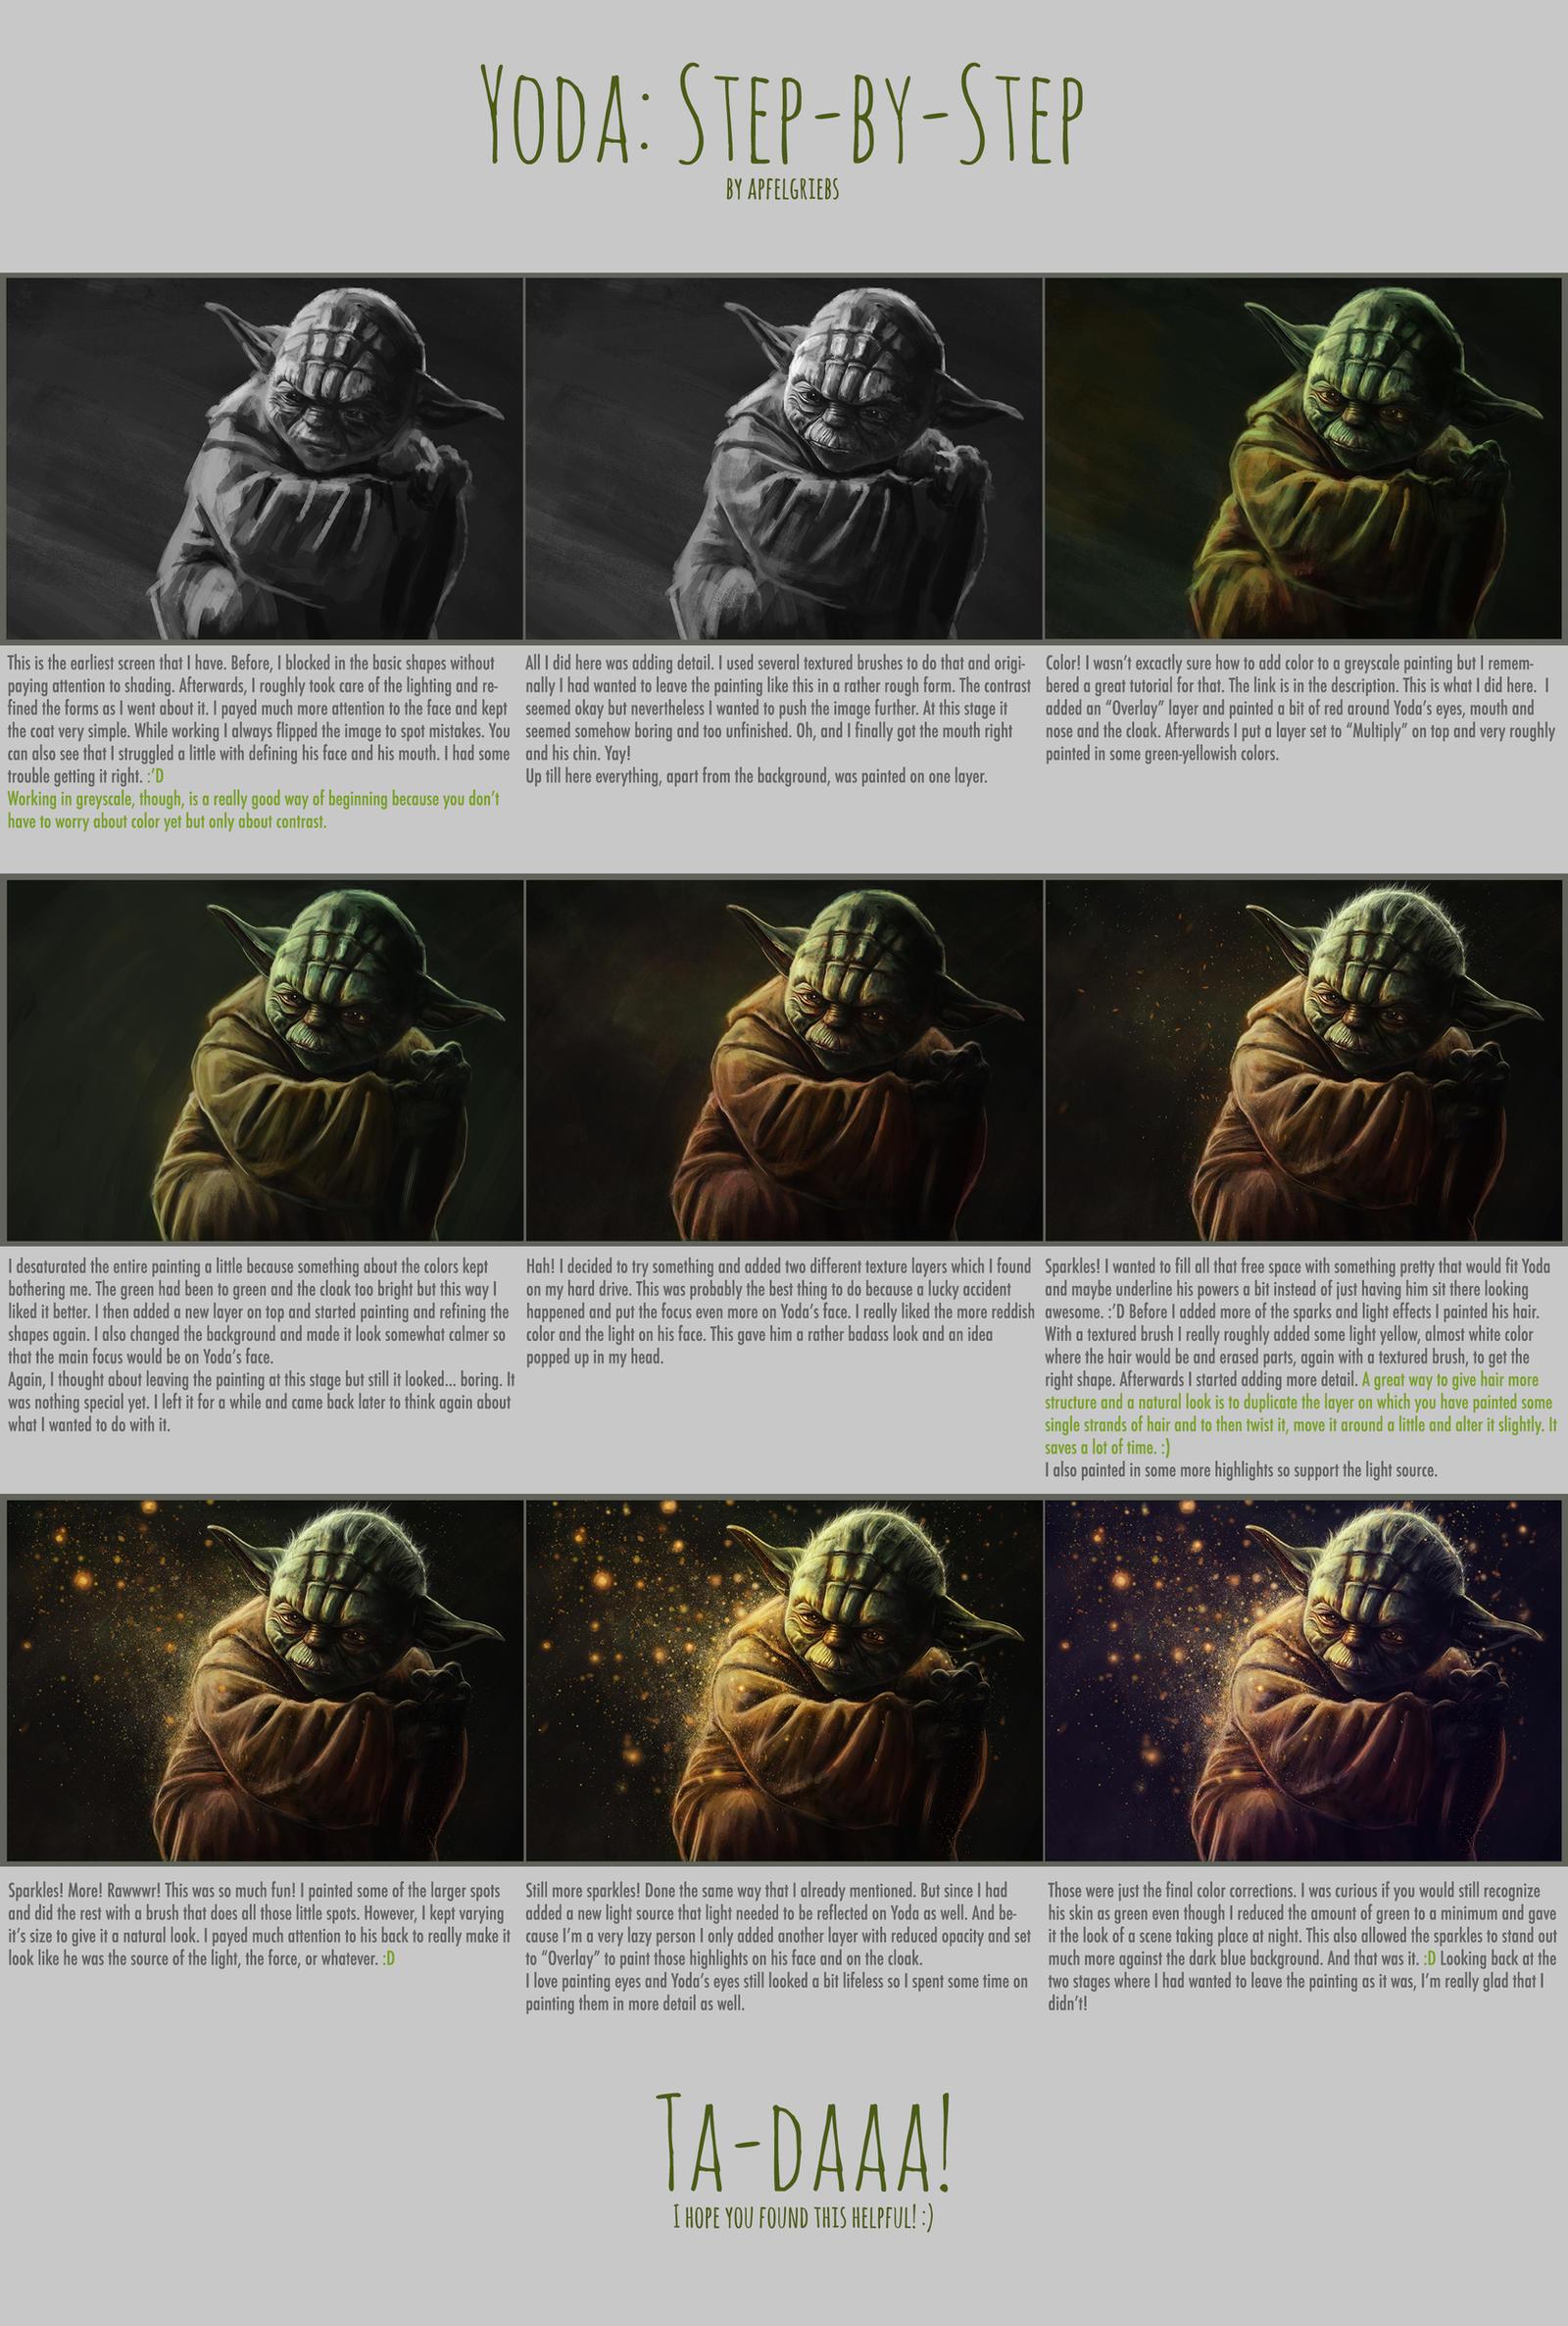 Yoda: Step by Step